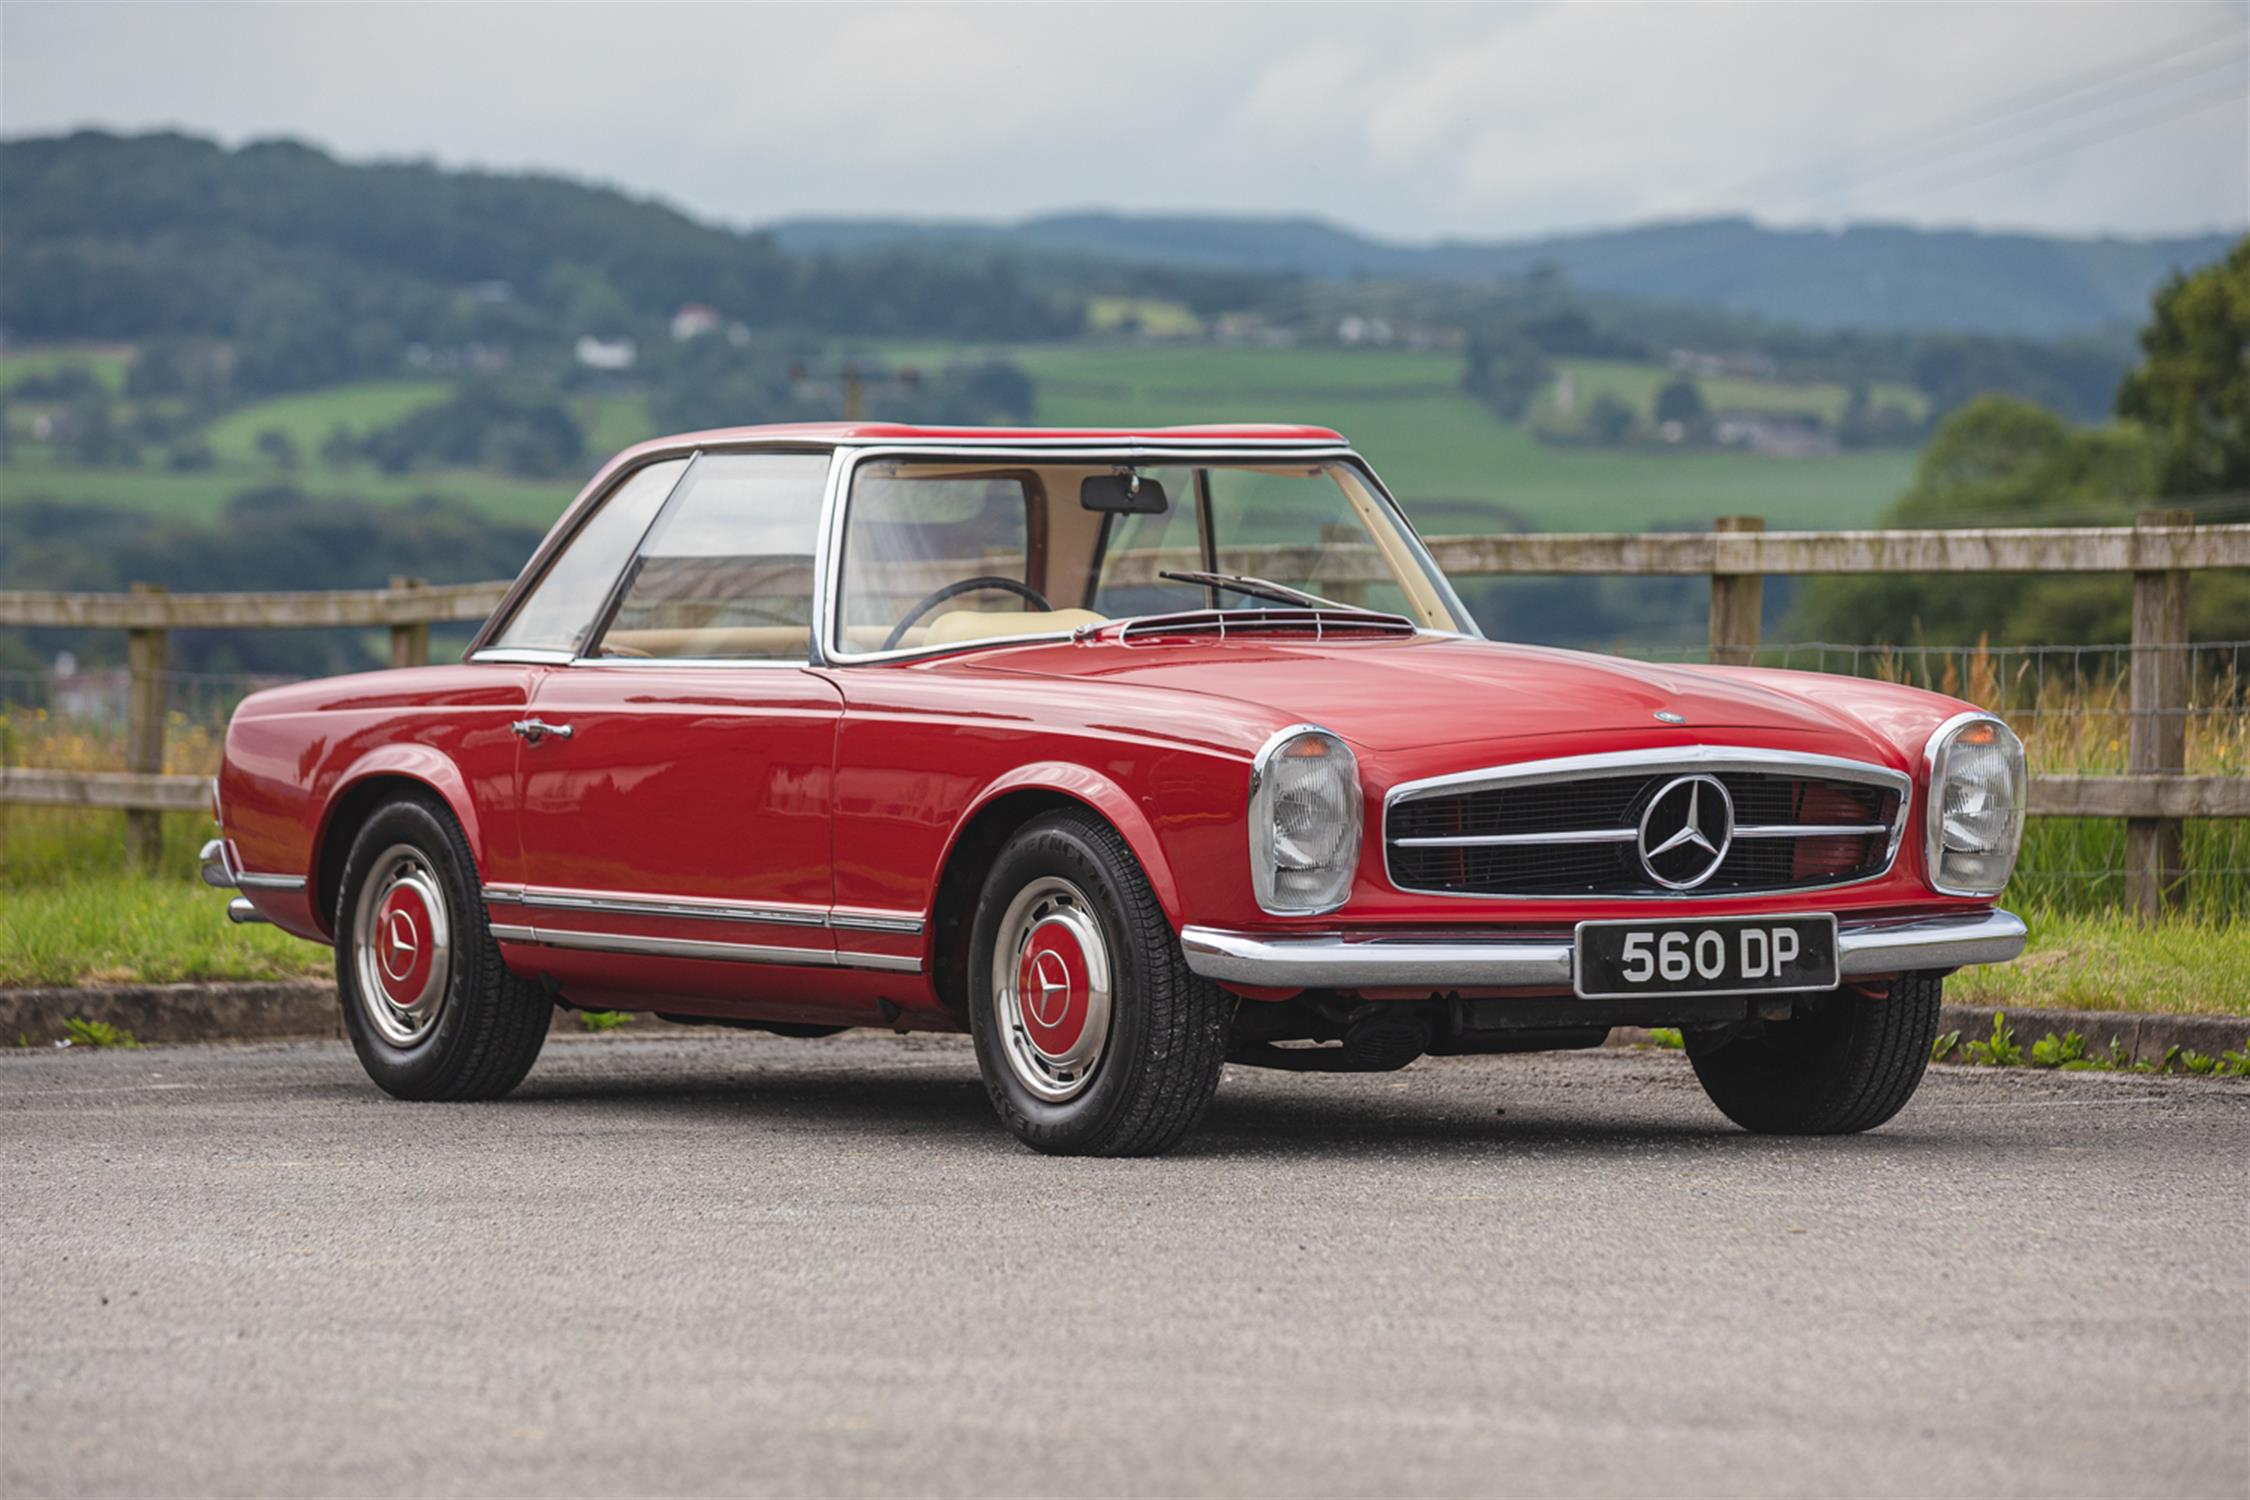 1969 Mercedes-Benz 280SL (W113) - Image 7 of 10